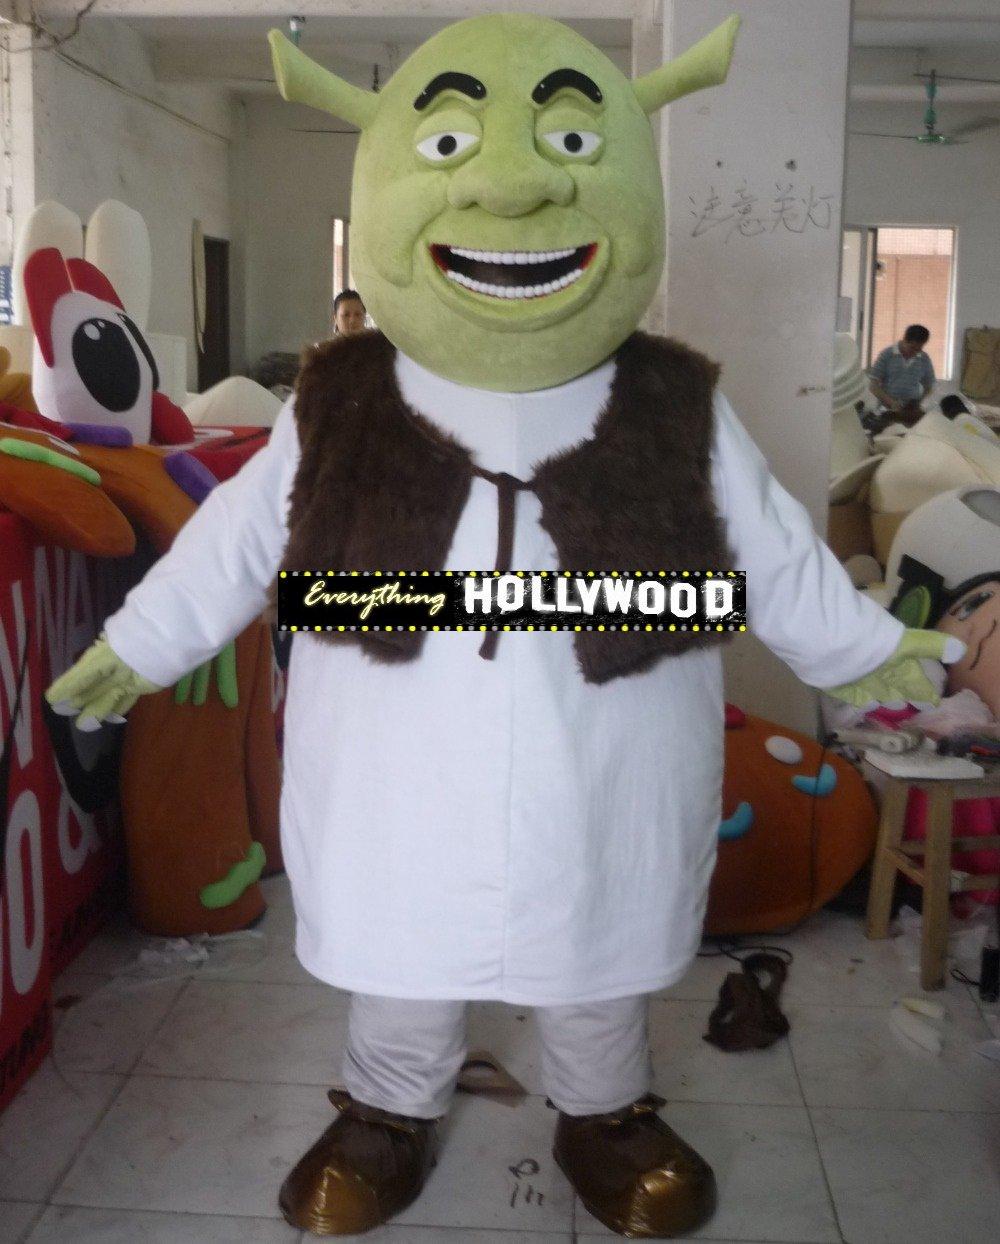 Shrek Mascot Costume Disney Cartoon Character -New 2015